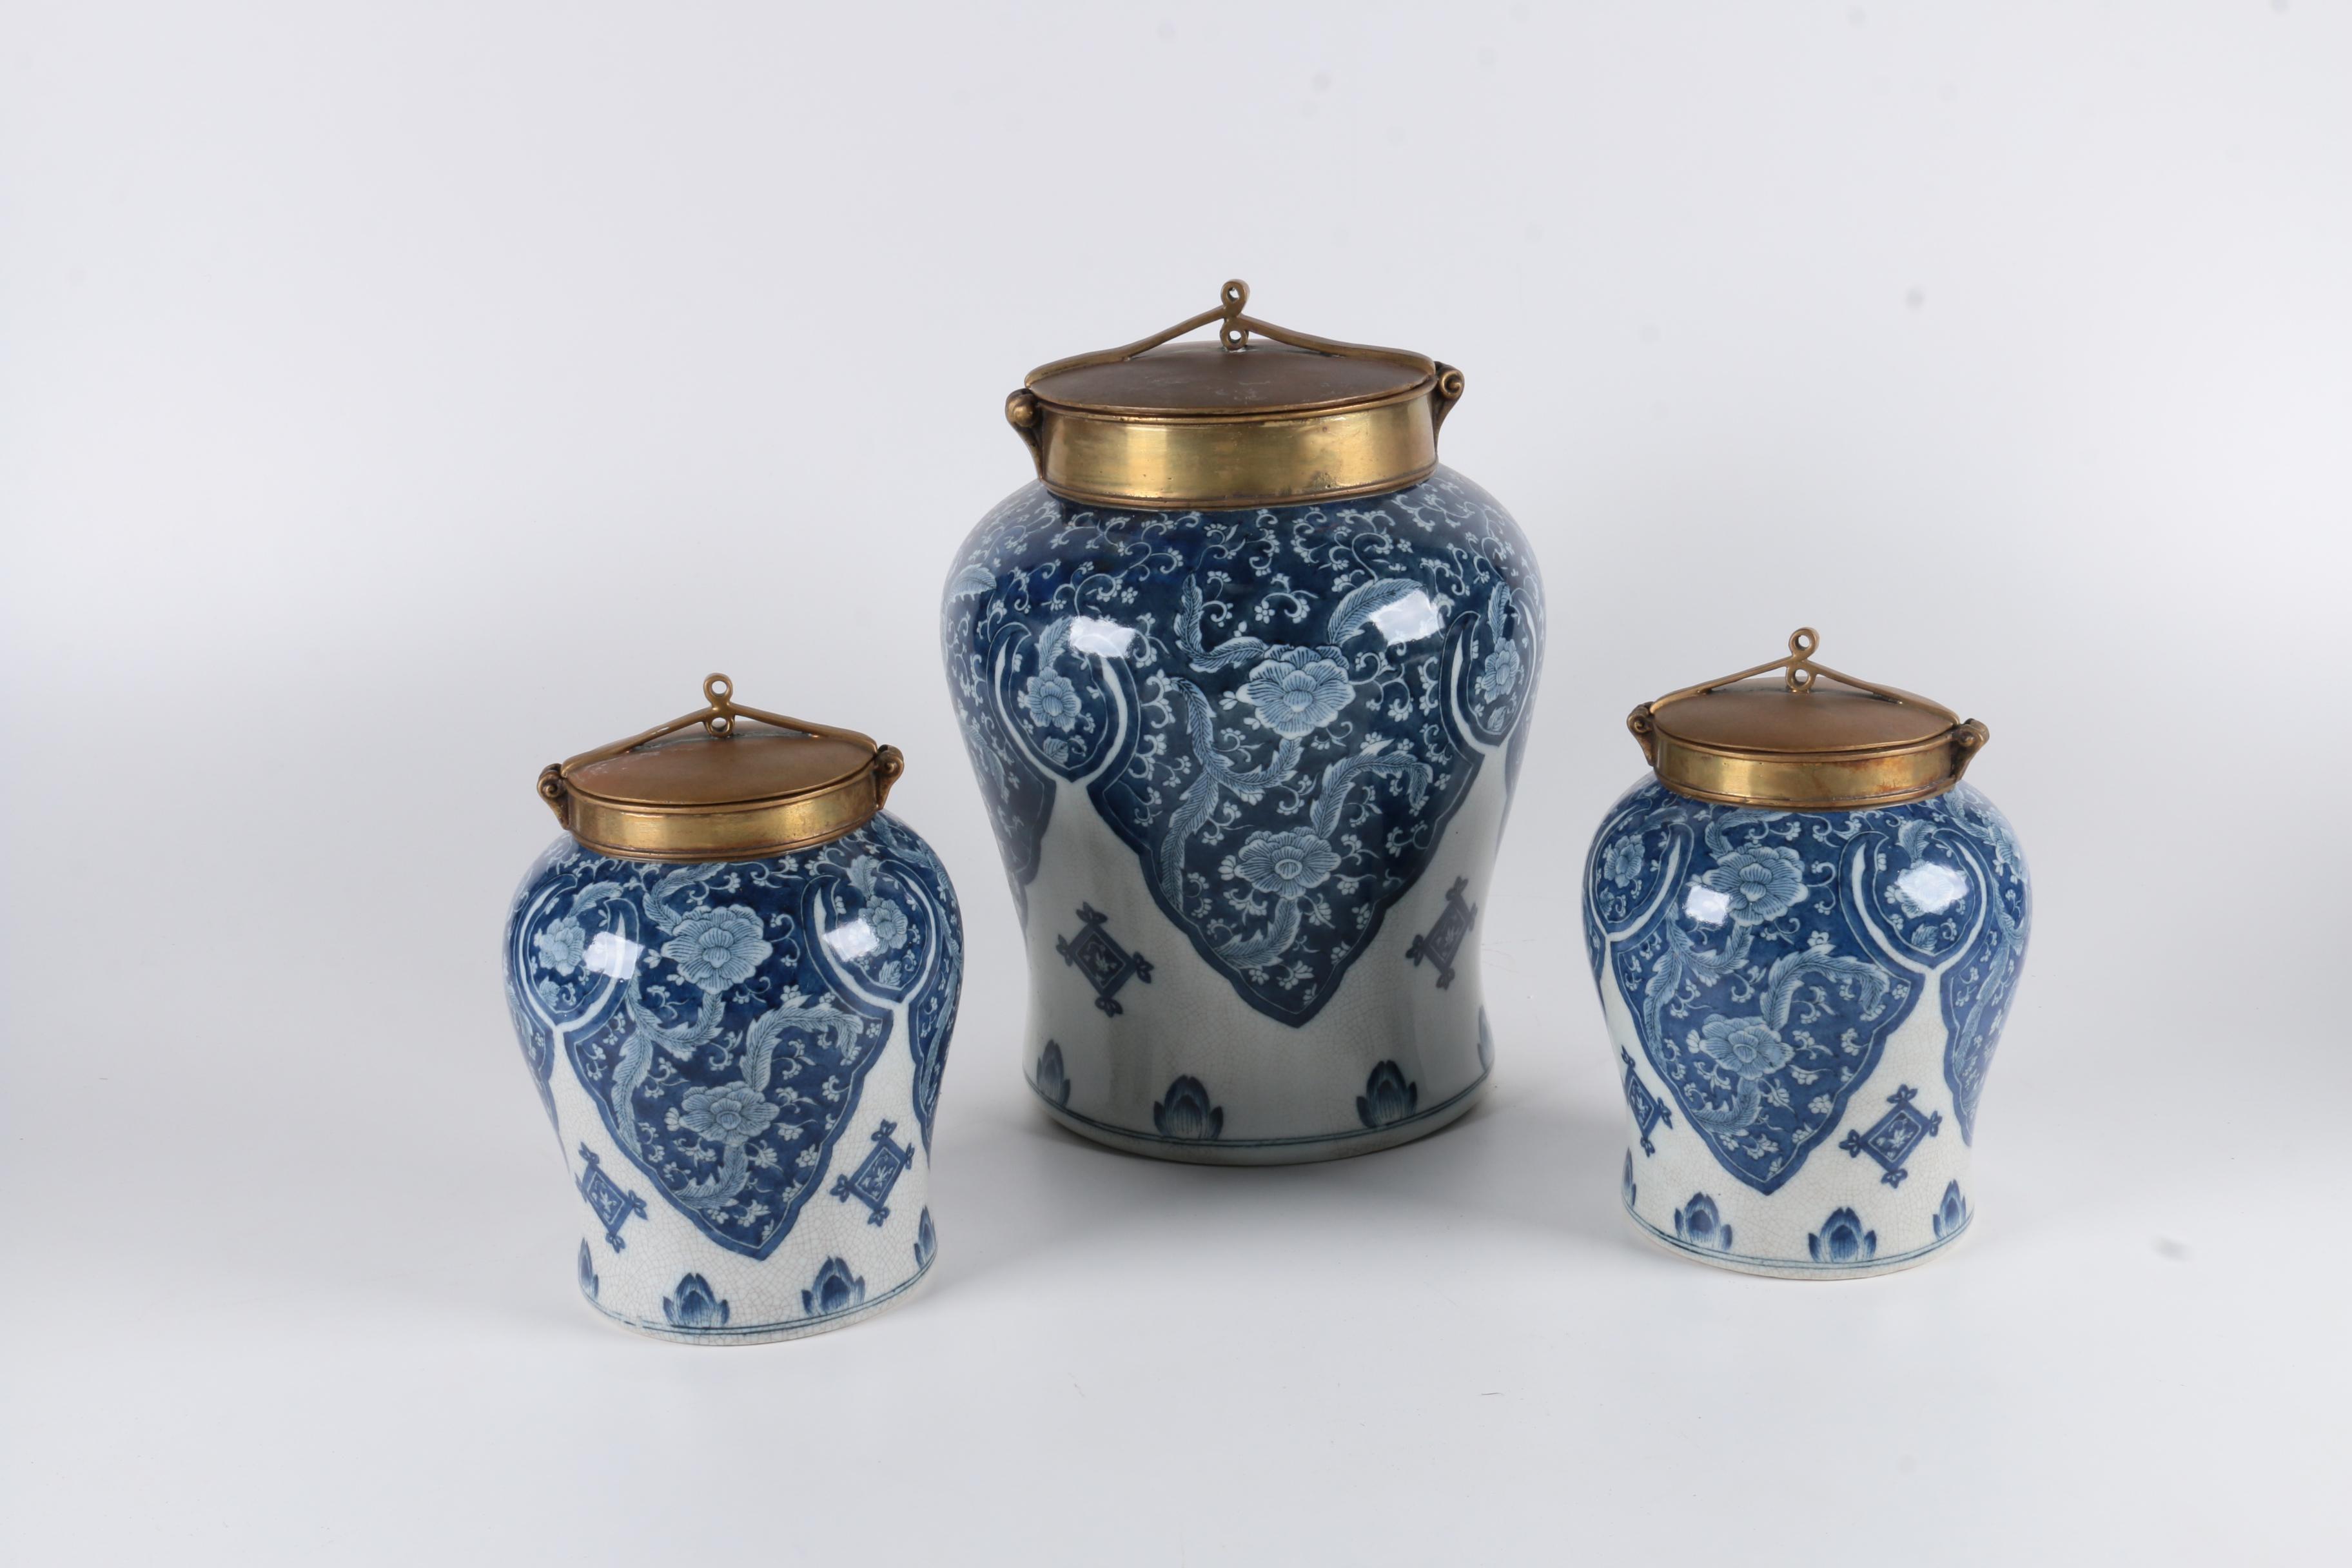 Set of Tozai Home Ceramic Ginger Jars